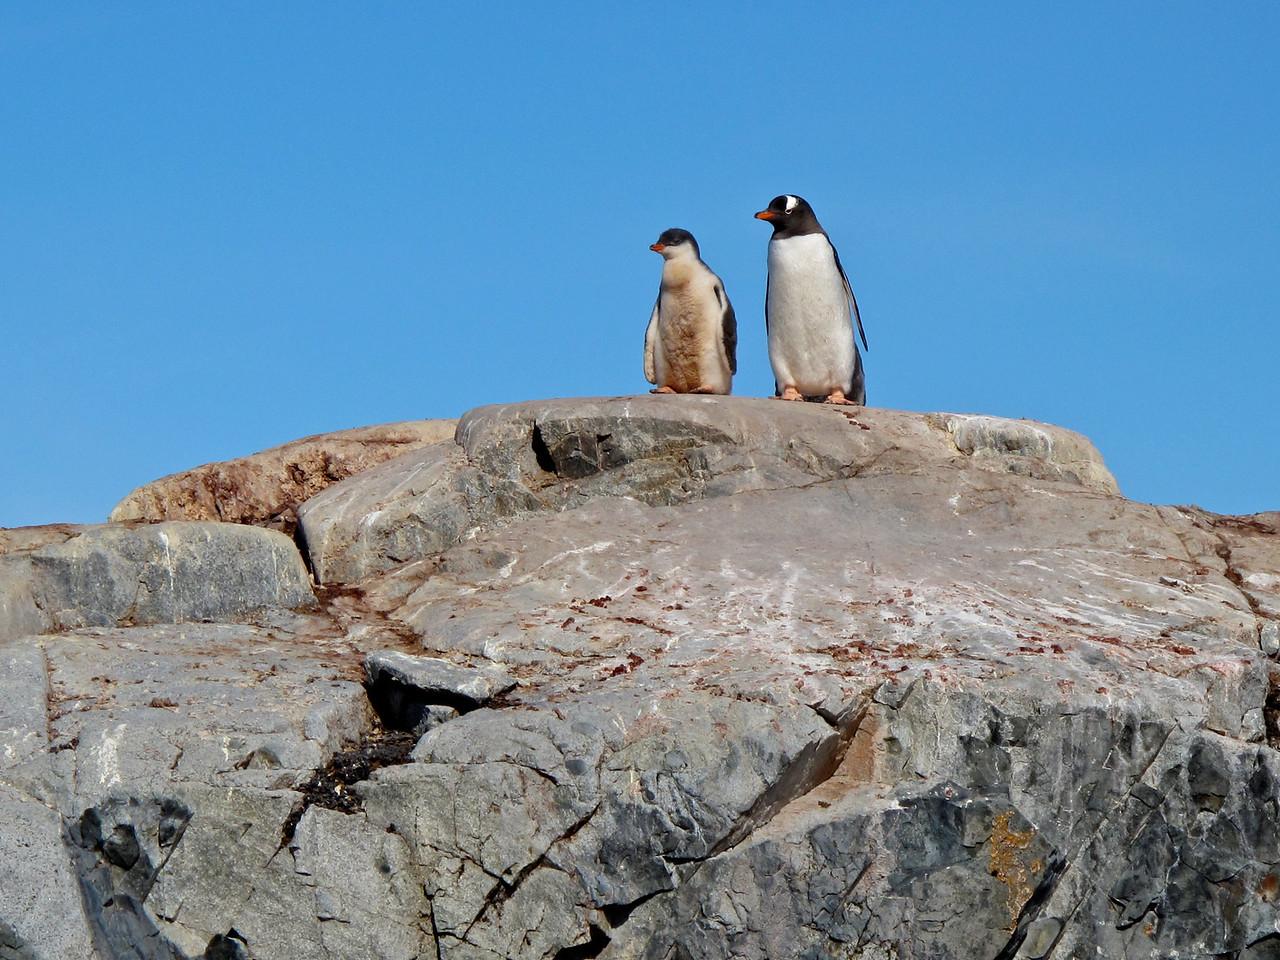 A Gentoo penguin parent and chick.